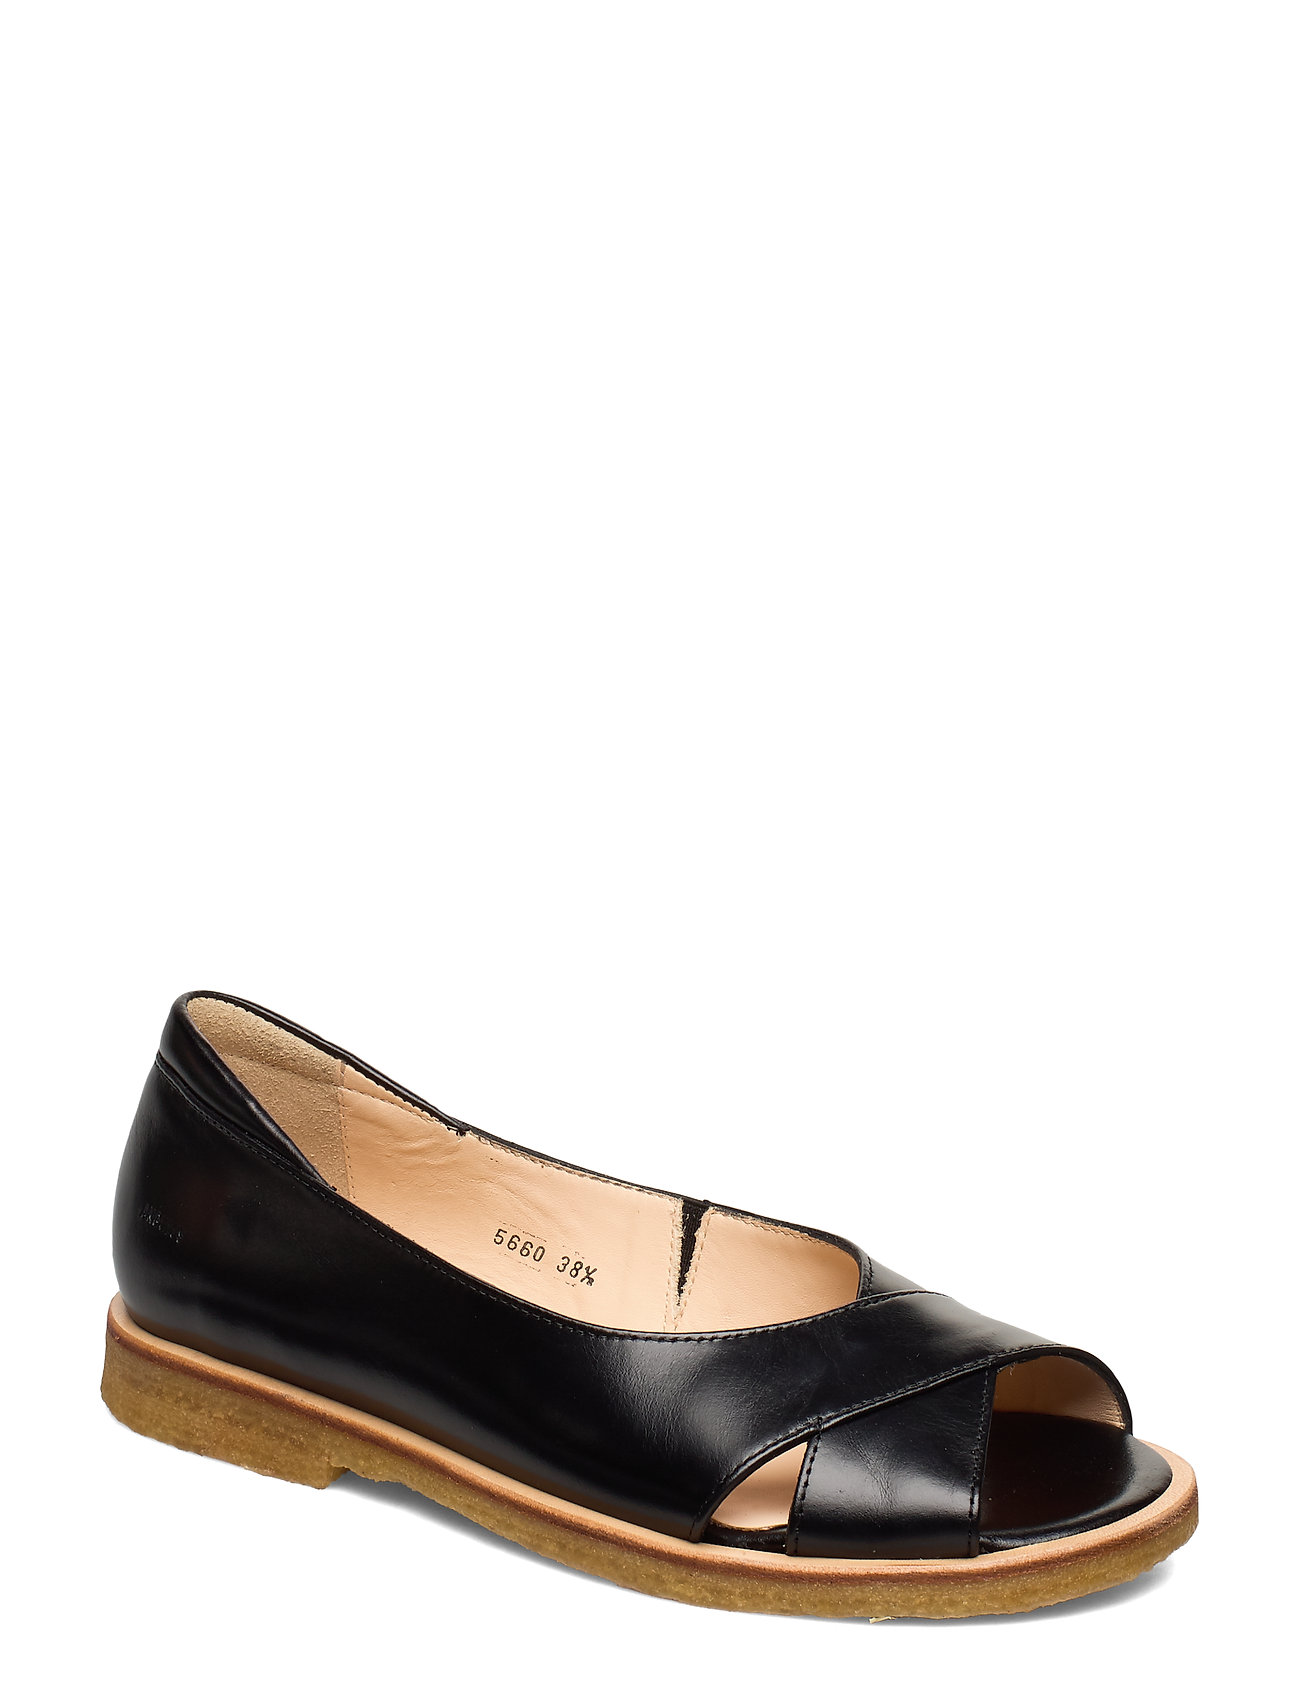 Image of Sandals - Flat - Open Toe - Clo Shoes Summer Shoes Flat Sandals Sort ANGULUS (3321794113)